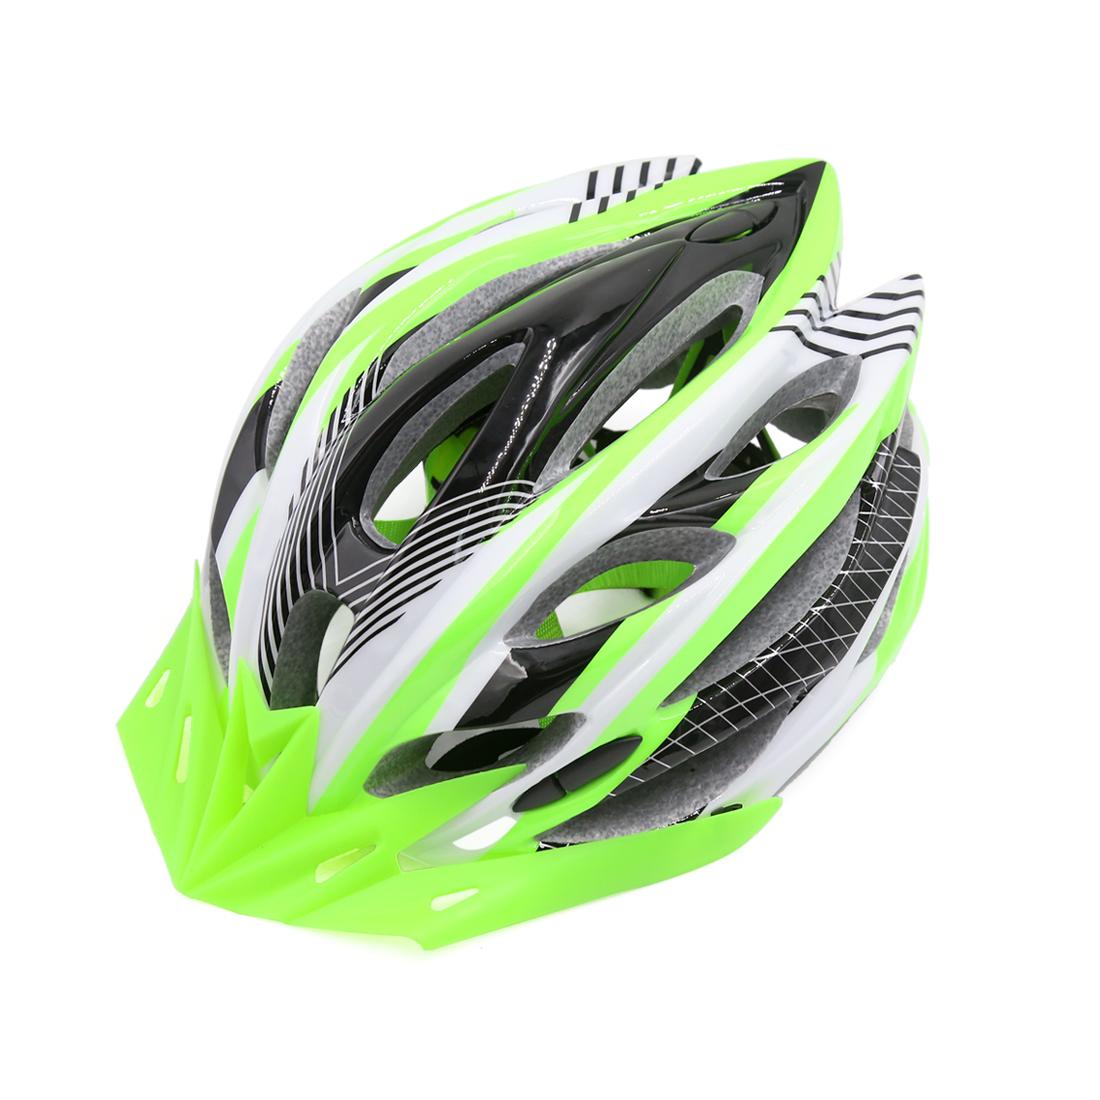 Green Black Adjustable Adult Helmet w Visor for Road Bike Racing Bicycle Cycling